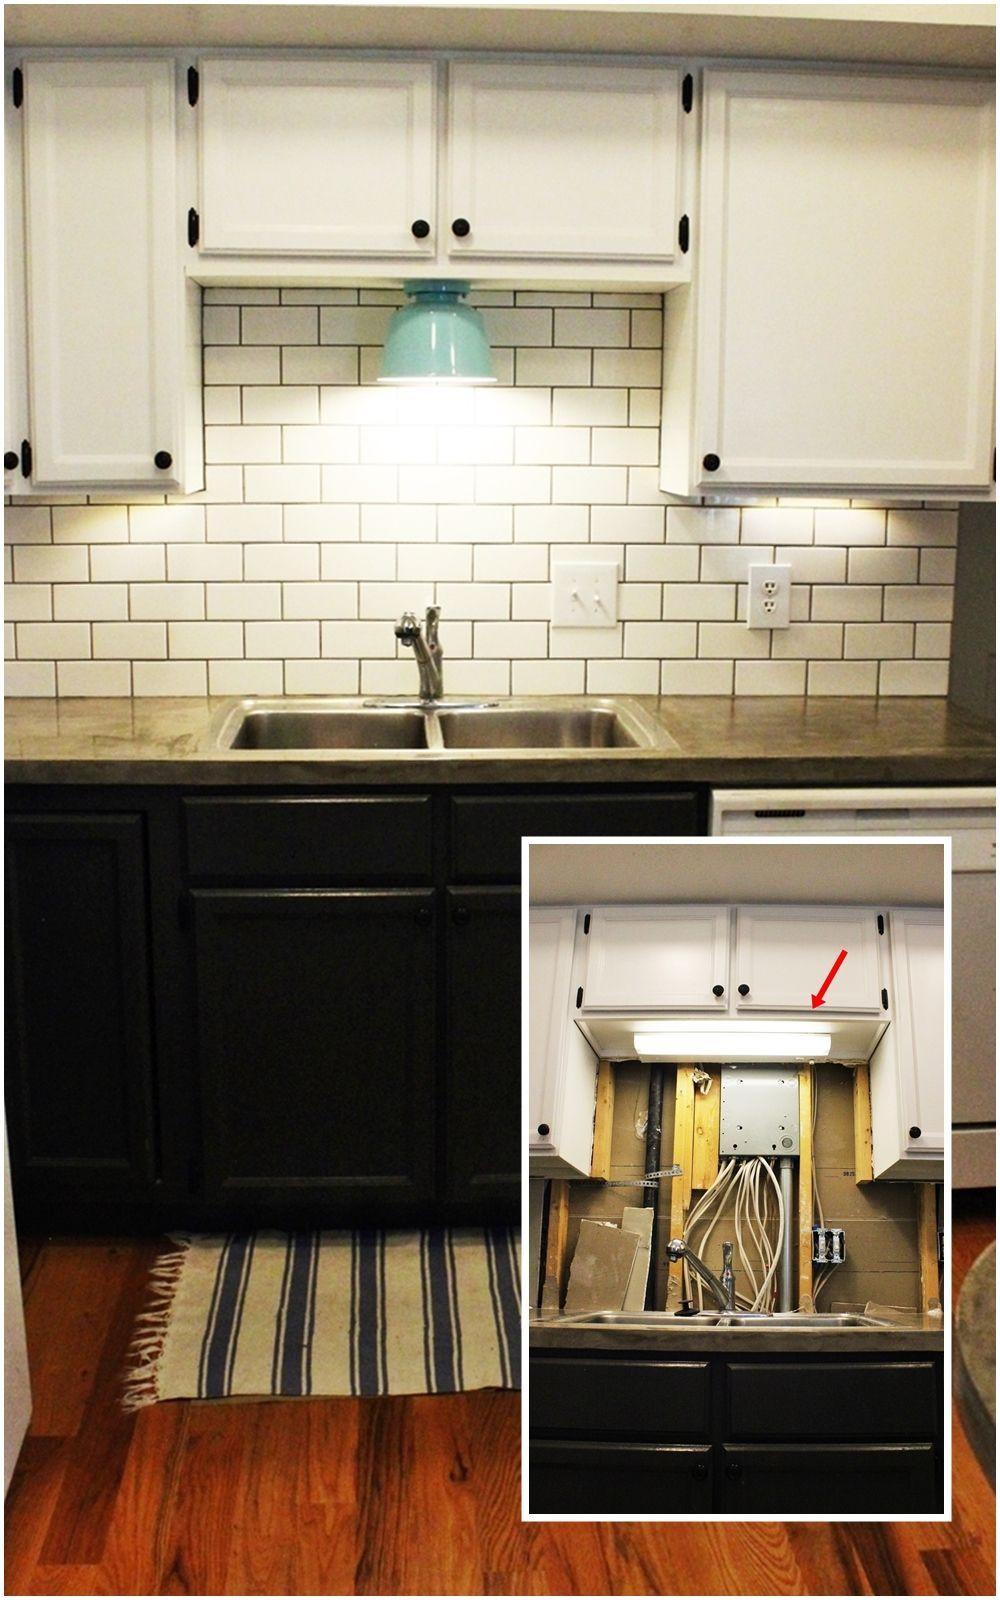 Kitchen Led Lights Under Cabinet  DIY Kitchen Lighting Upgrade LED Under Cabinet Lights